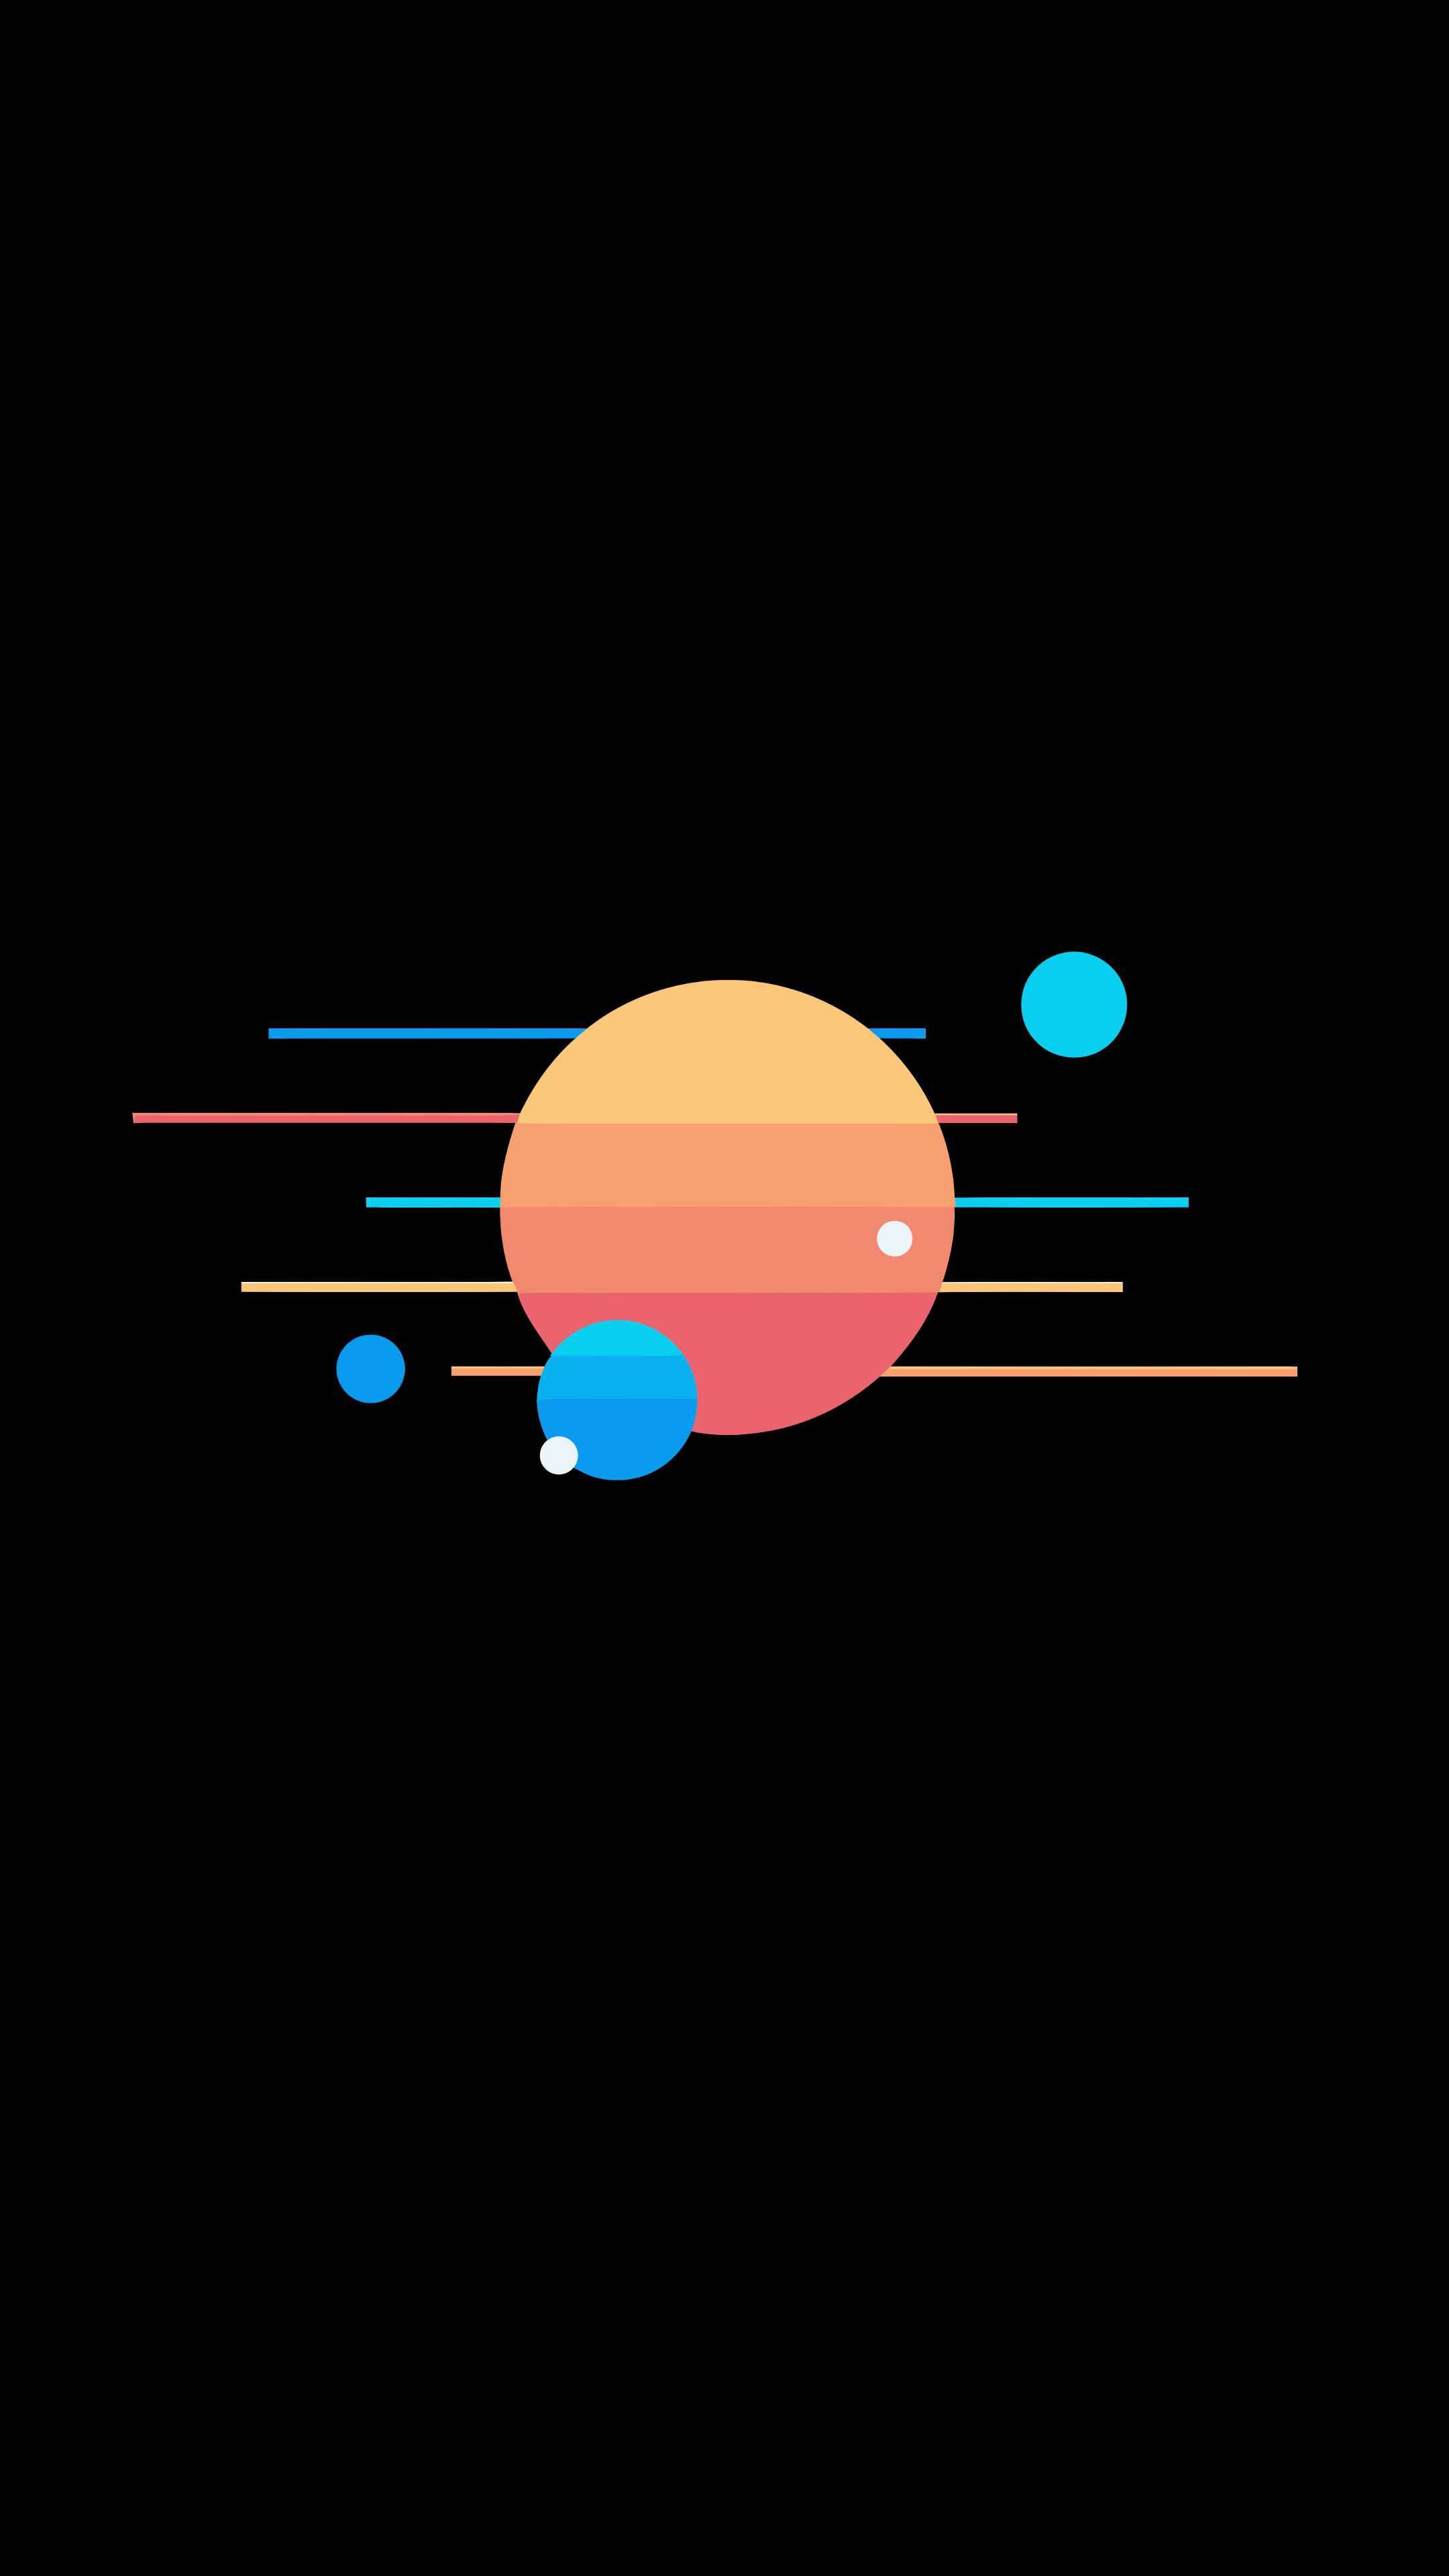 Amoled Planets Sun iPhone Wallpaper